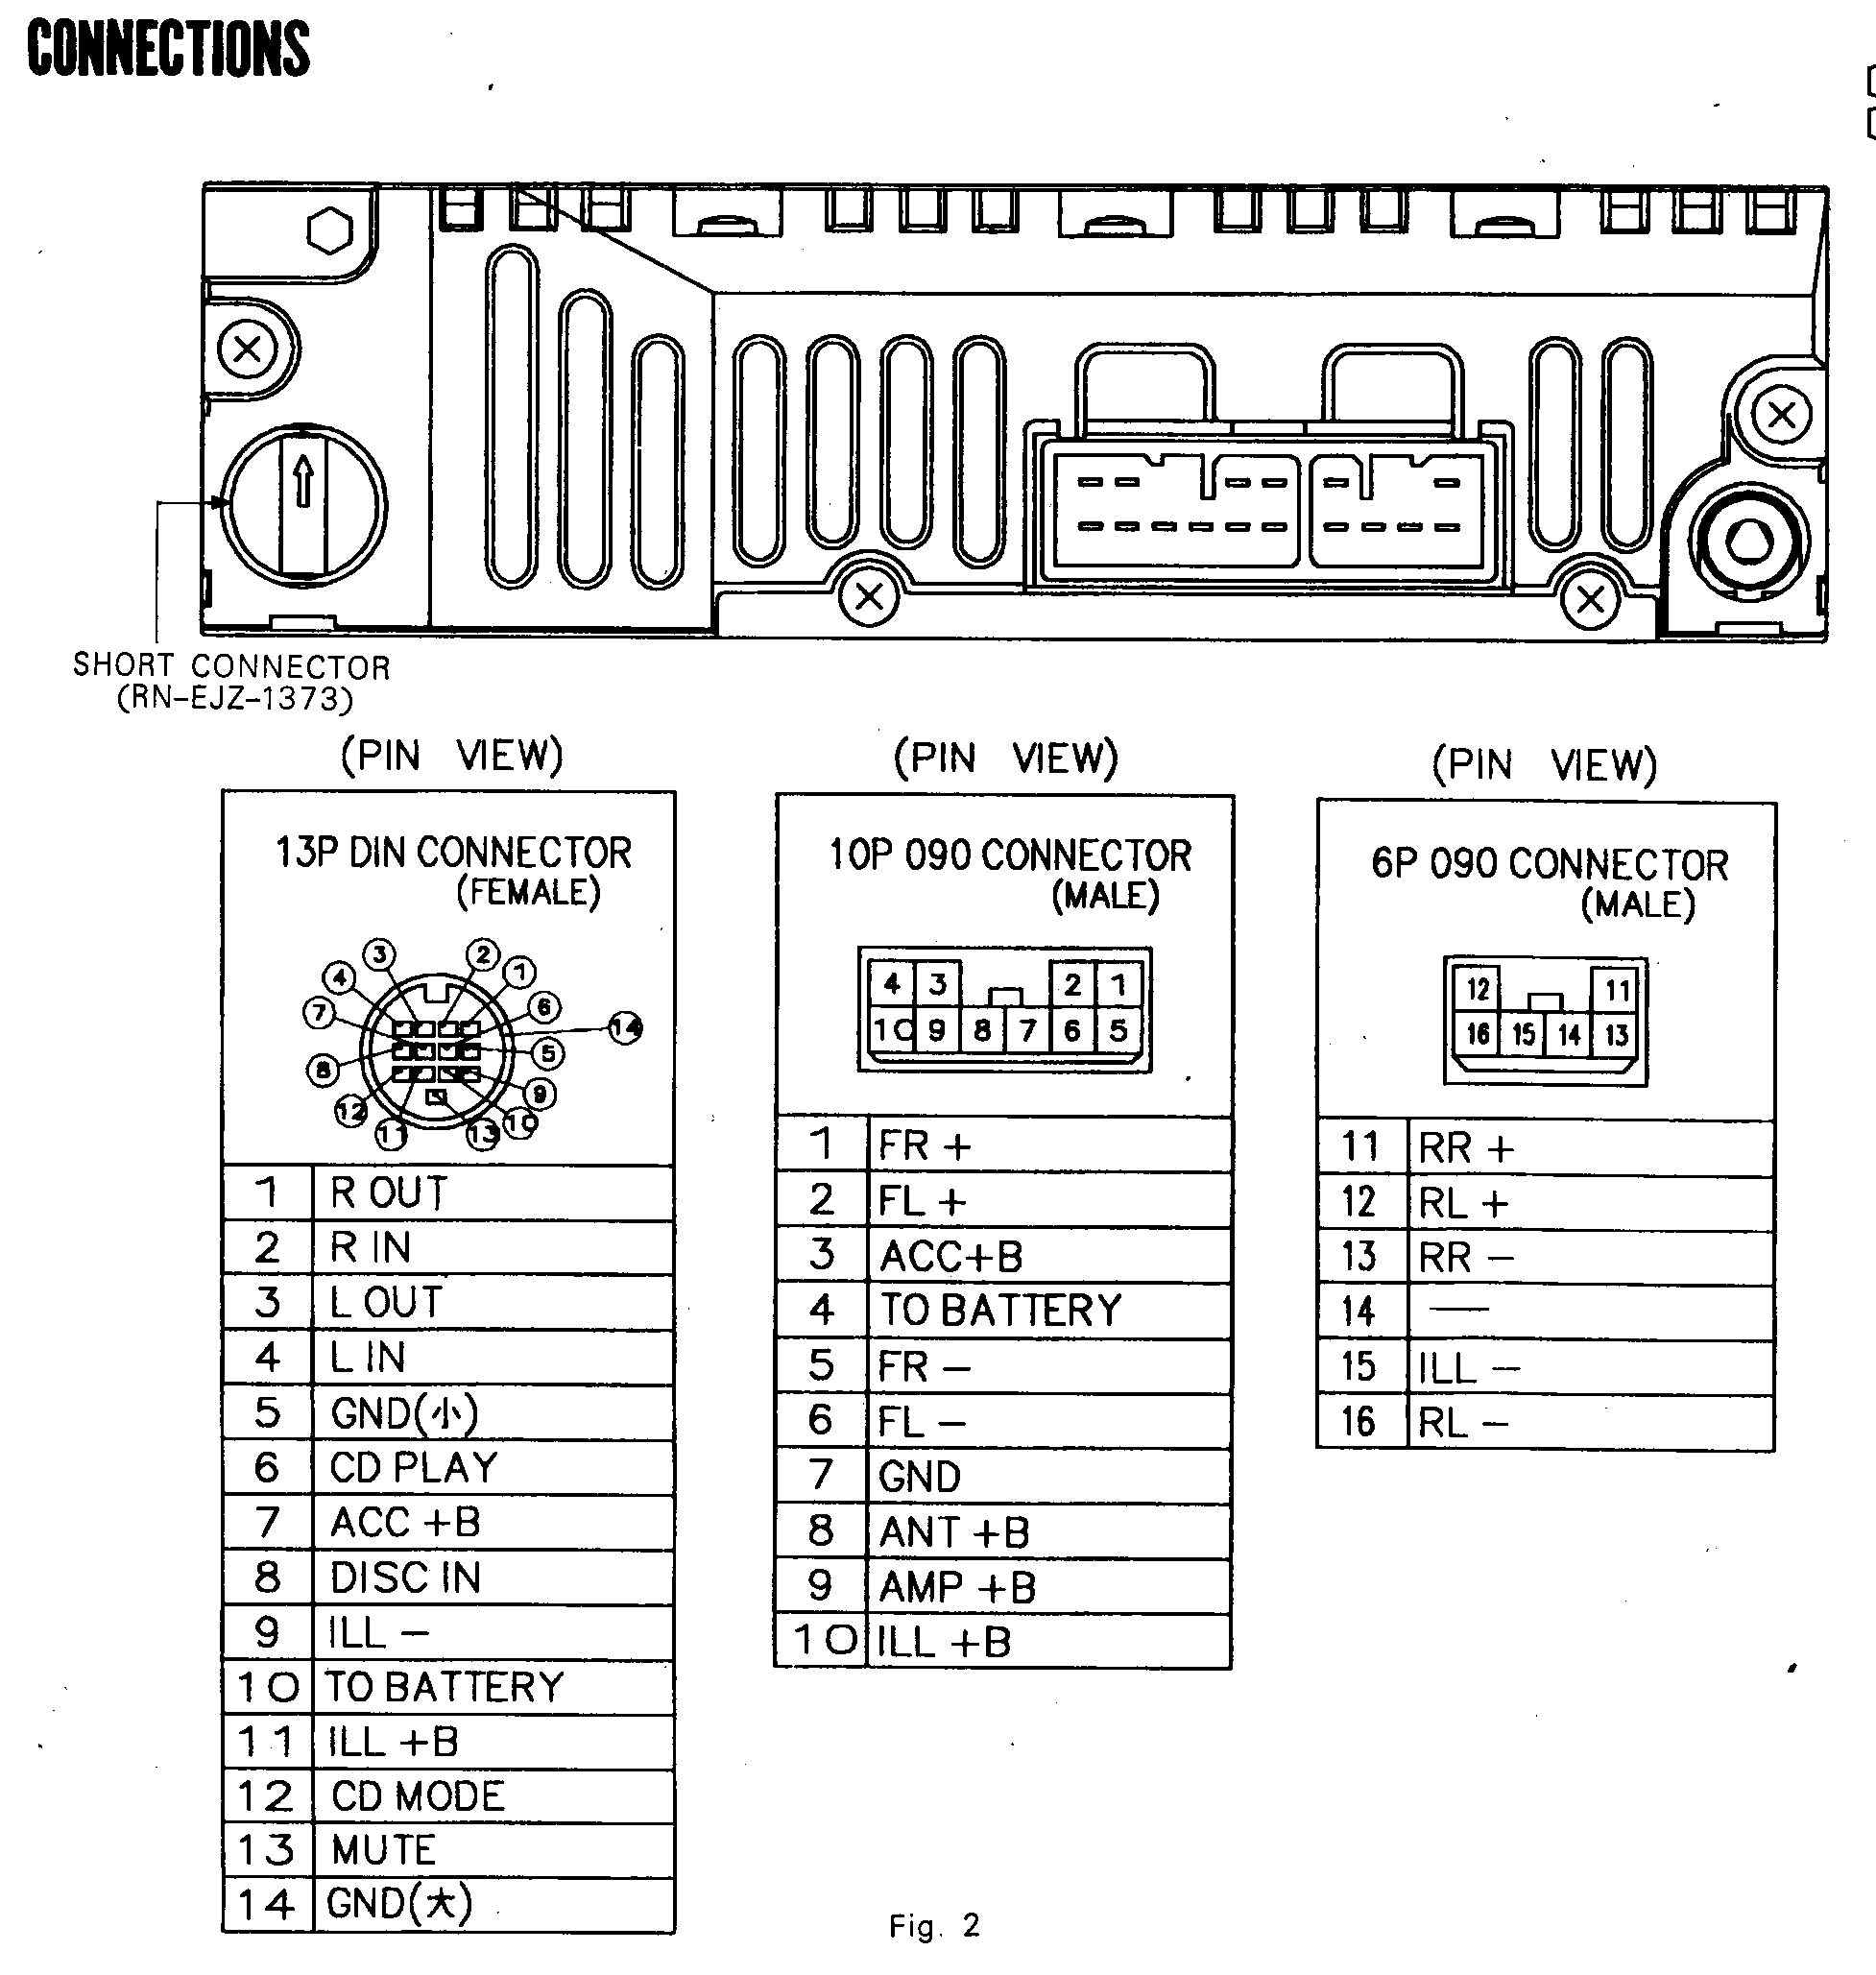 2001 Isuzu Trooper Stereo Wiring Diagram - Somurich.com on 01 mercury cougar transmission, 01 ford ranger transmission, 01 mazda tribute transmission, 01 chevy trailblazer transmission, 01 ford escape transmission, 01 honda accord transmission, 01 honda passport transmission,